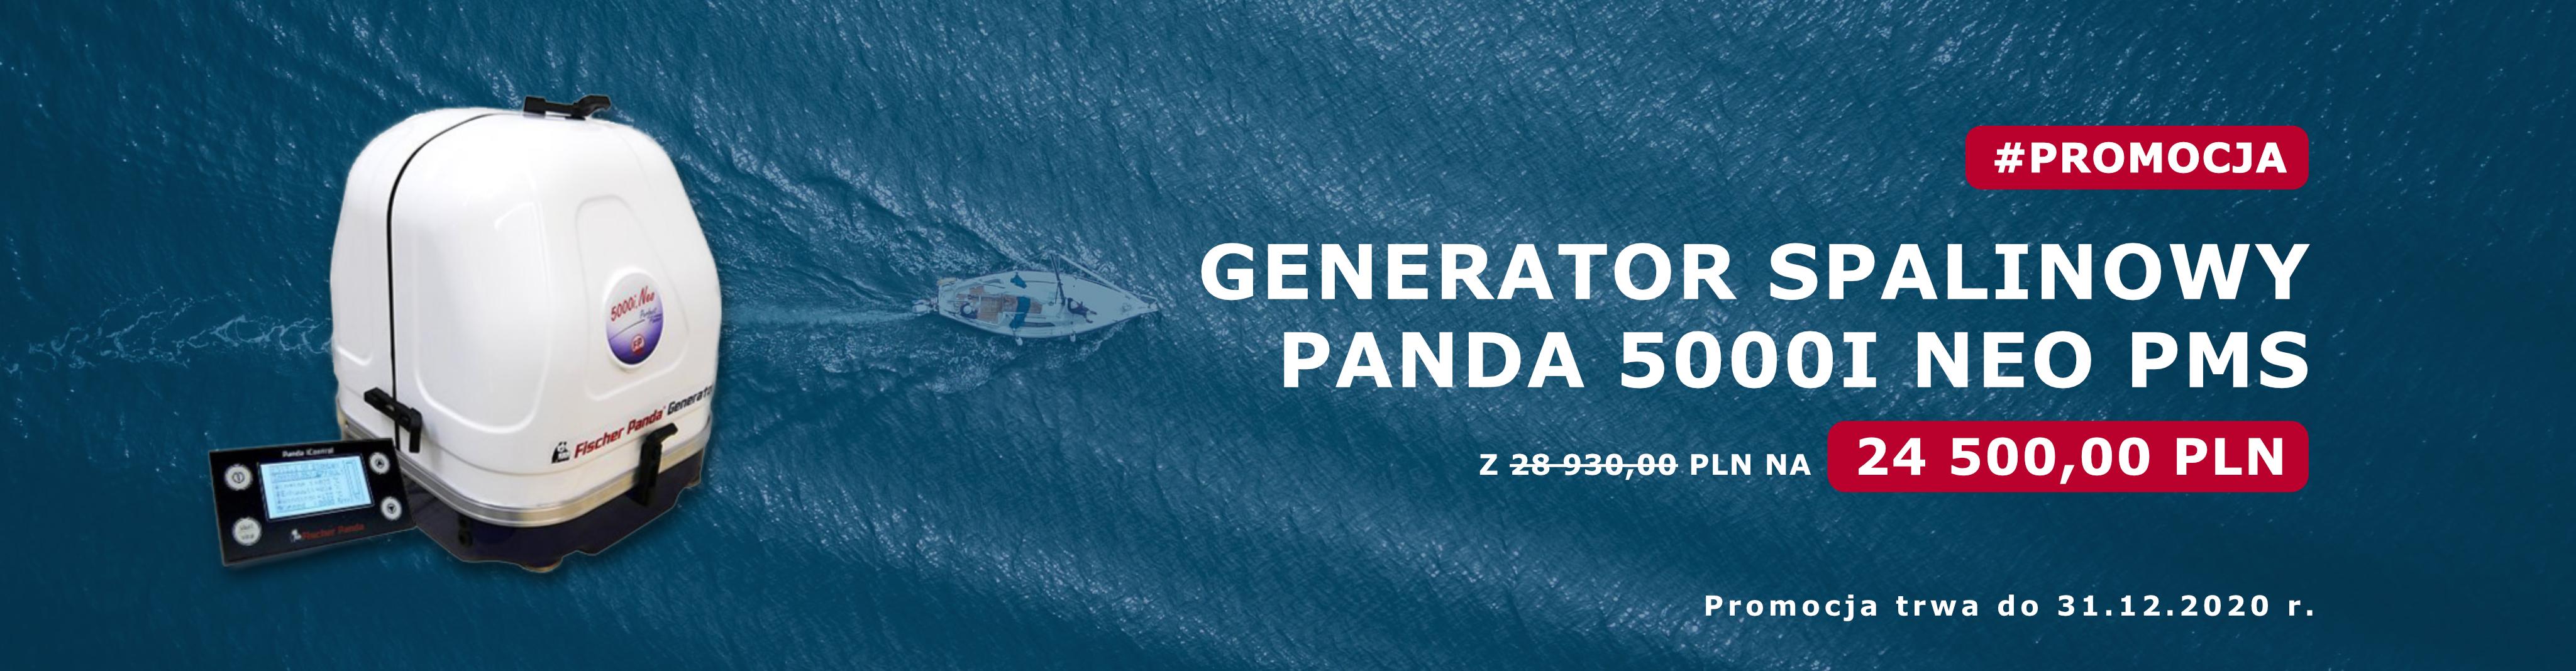 Panda 5000i